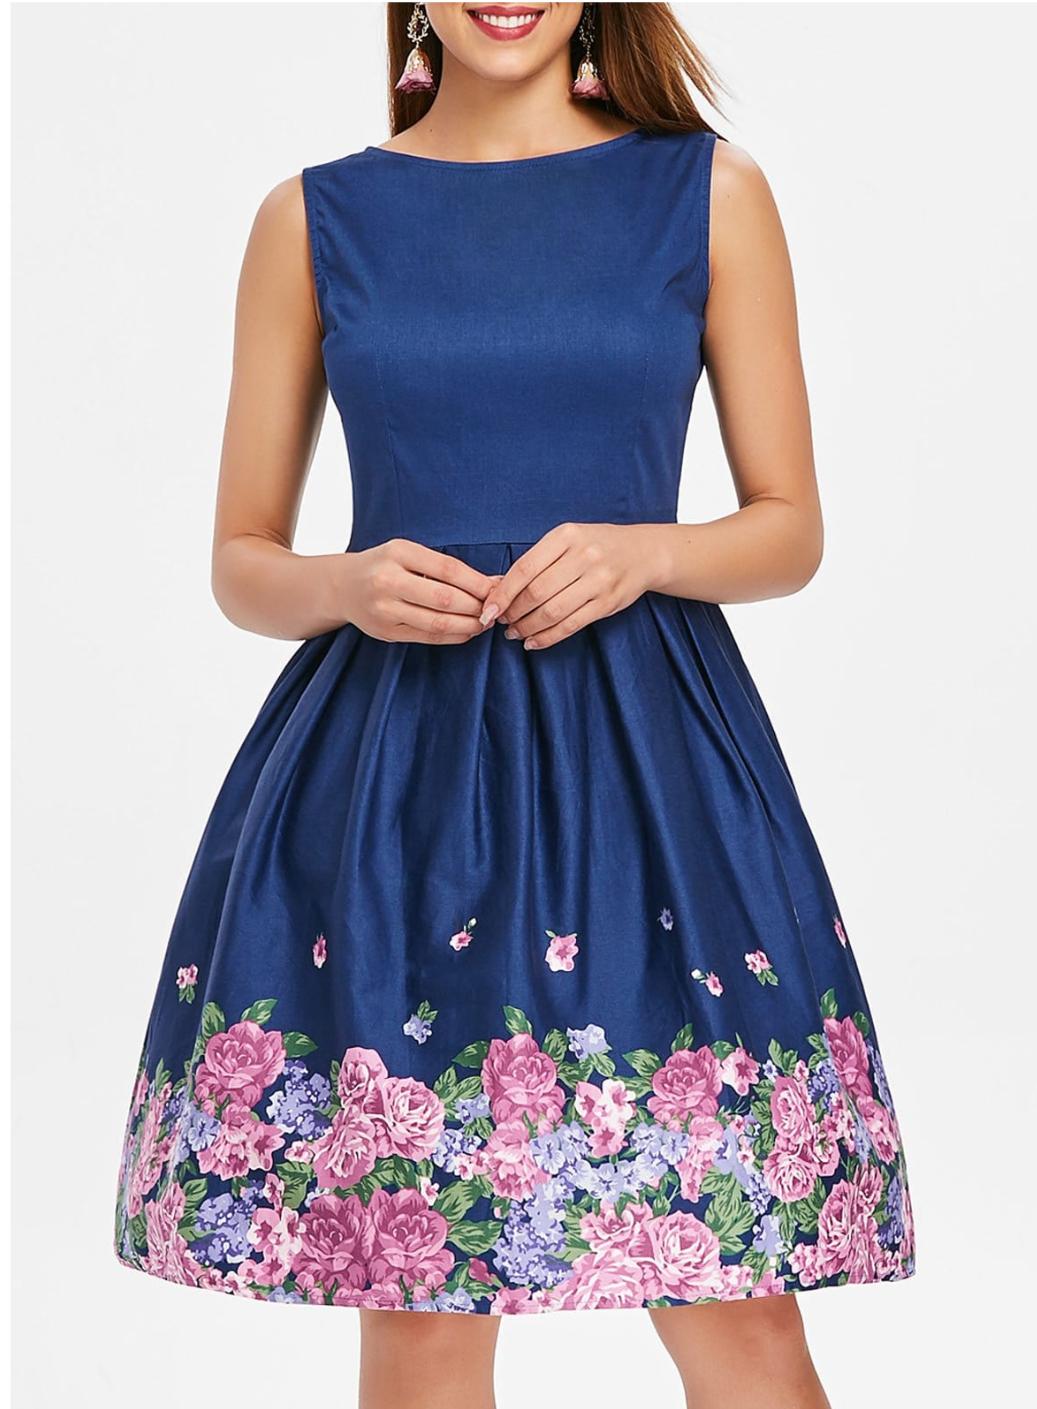 Loja Online Rosegal | Dicas De Vestidos